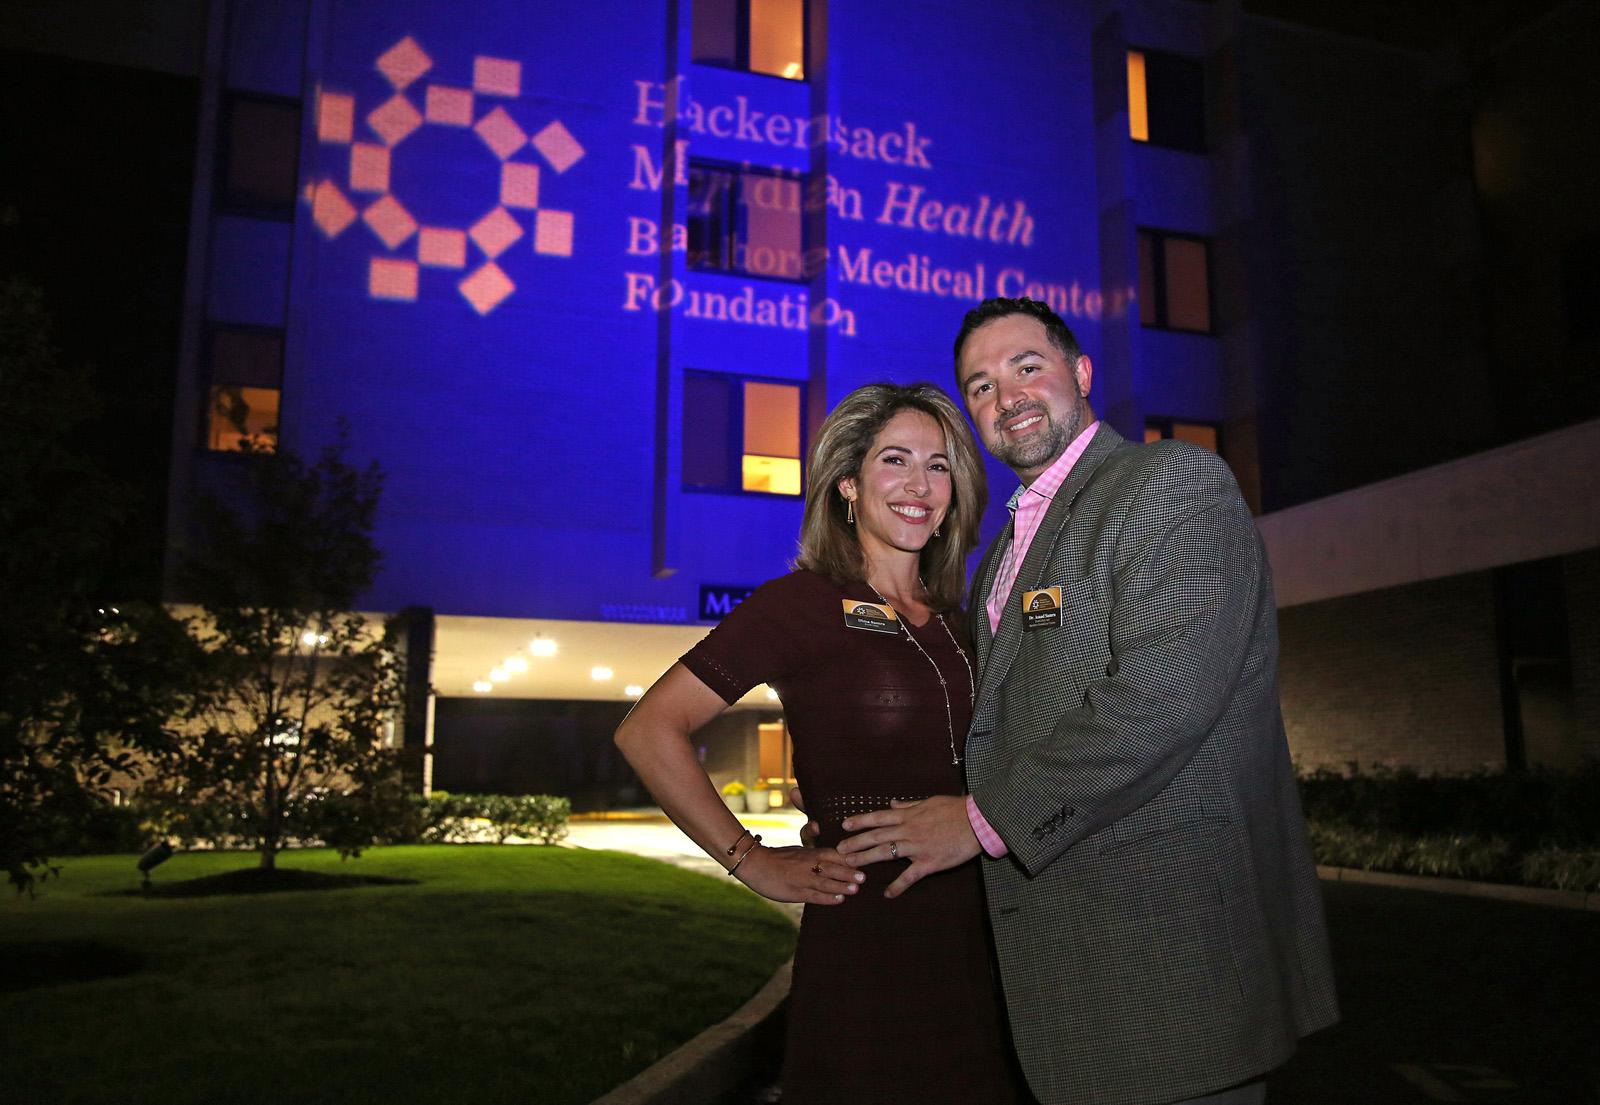 The Bayshore Medical Center Foundation Octoberfest